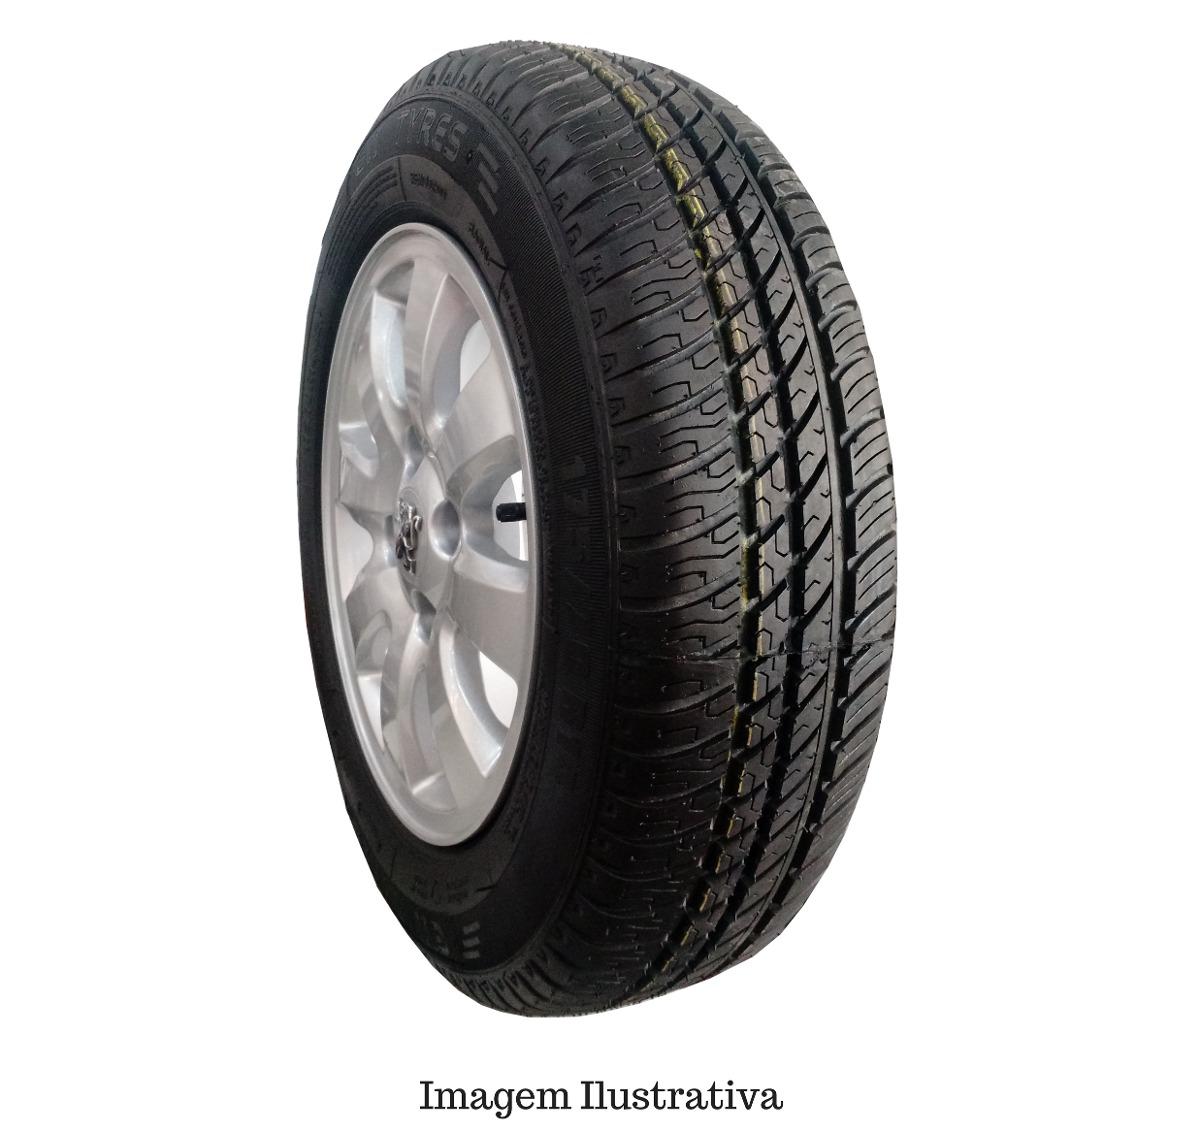 kit 4 pneu 175 70 r14 remold pirelli gw tyre 5 anos garantia r 688 00 em mercado livre. Black Bedroom Furniture Sets. Home Design Ideas